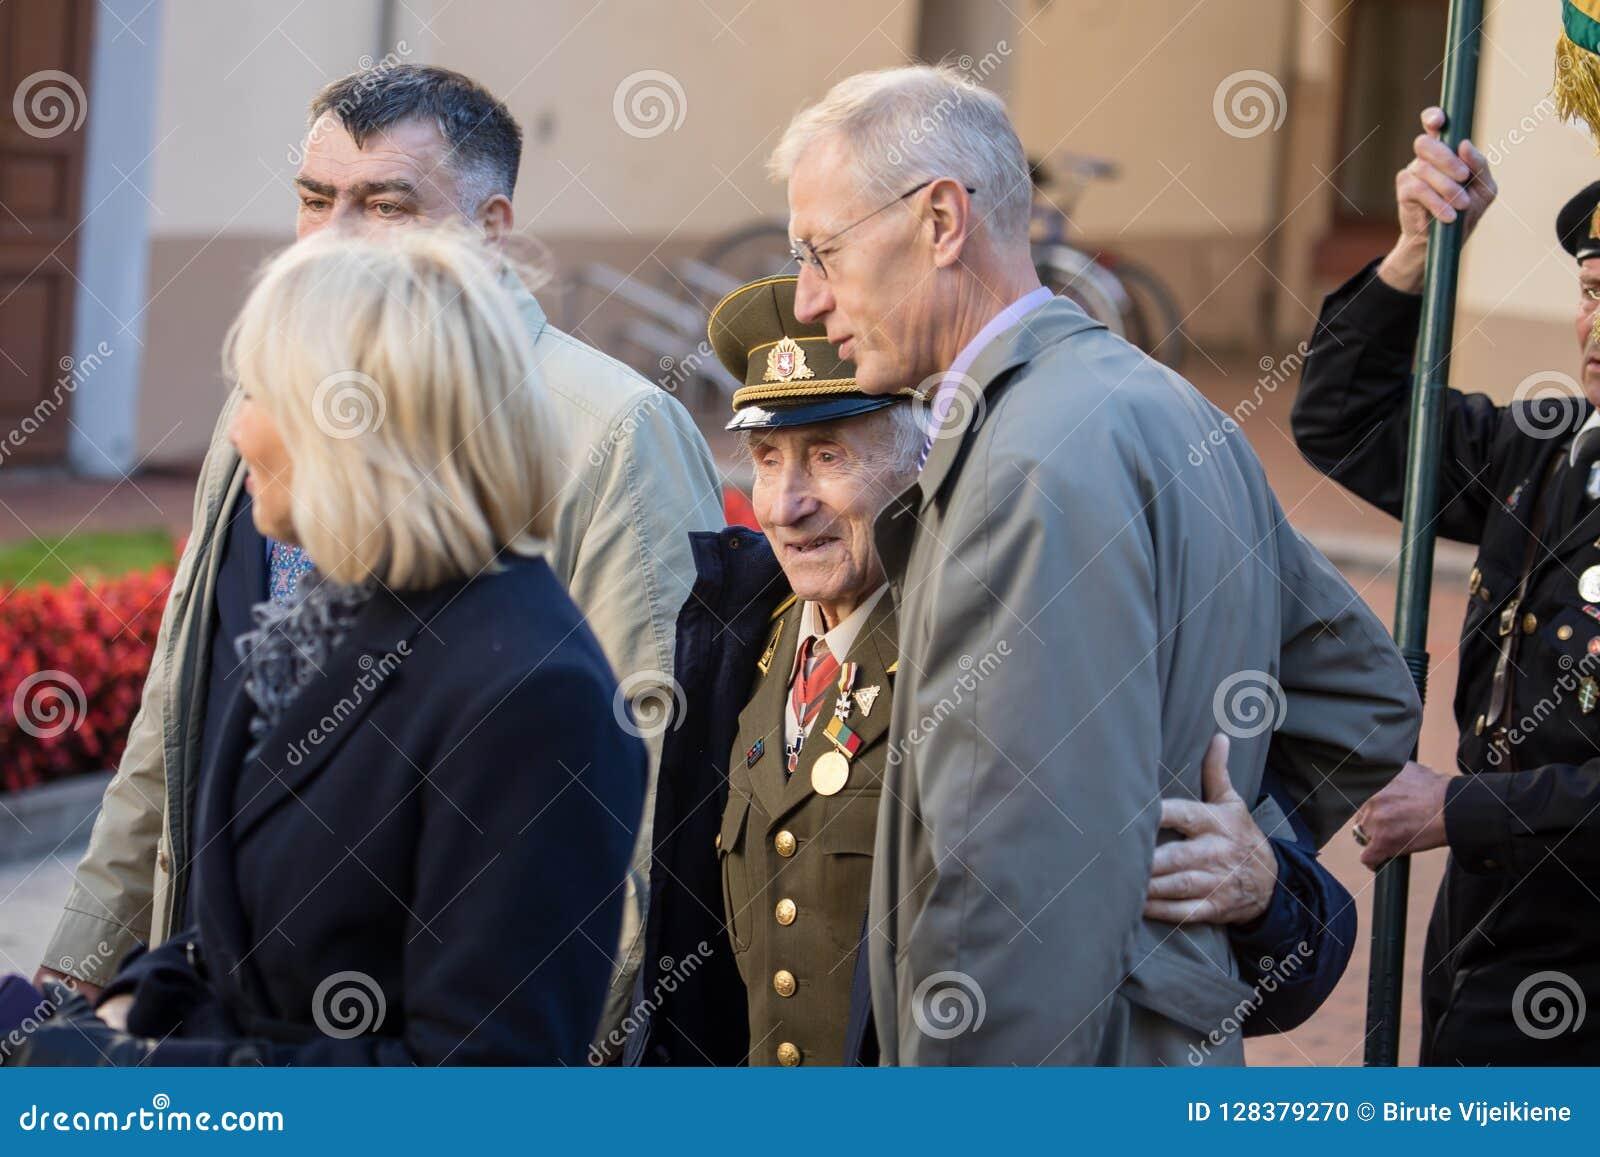 Funerale del generale di brigata Adolfas Ramanauskas-Vanagas in Viln